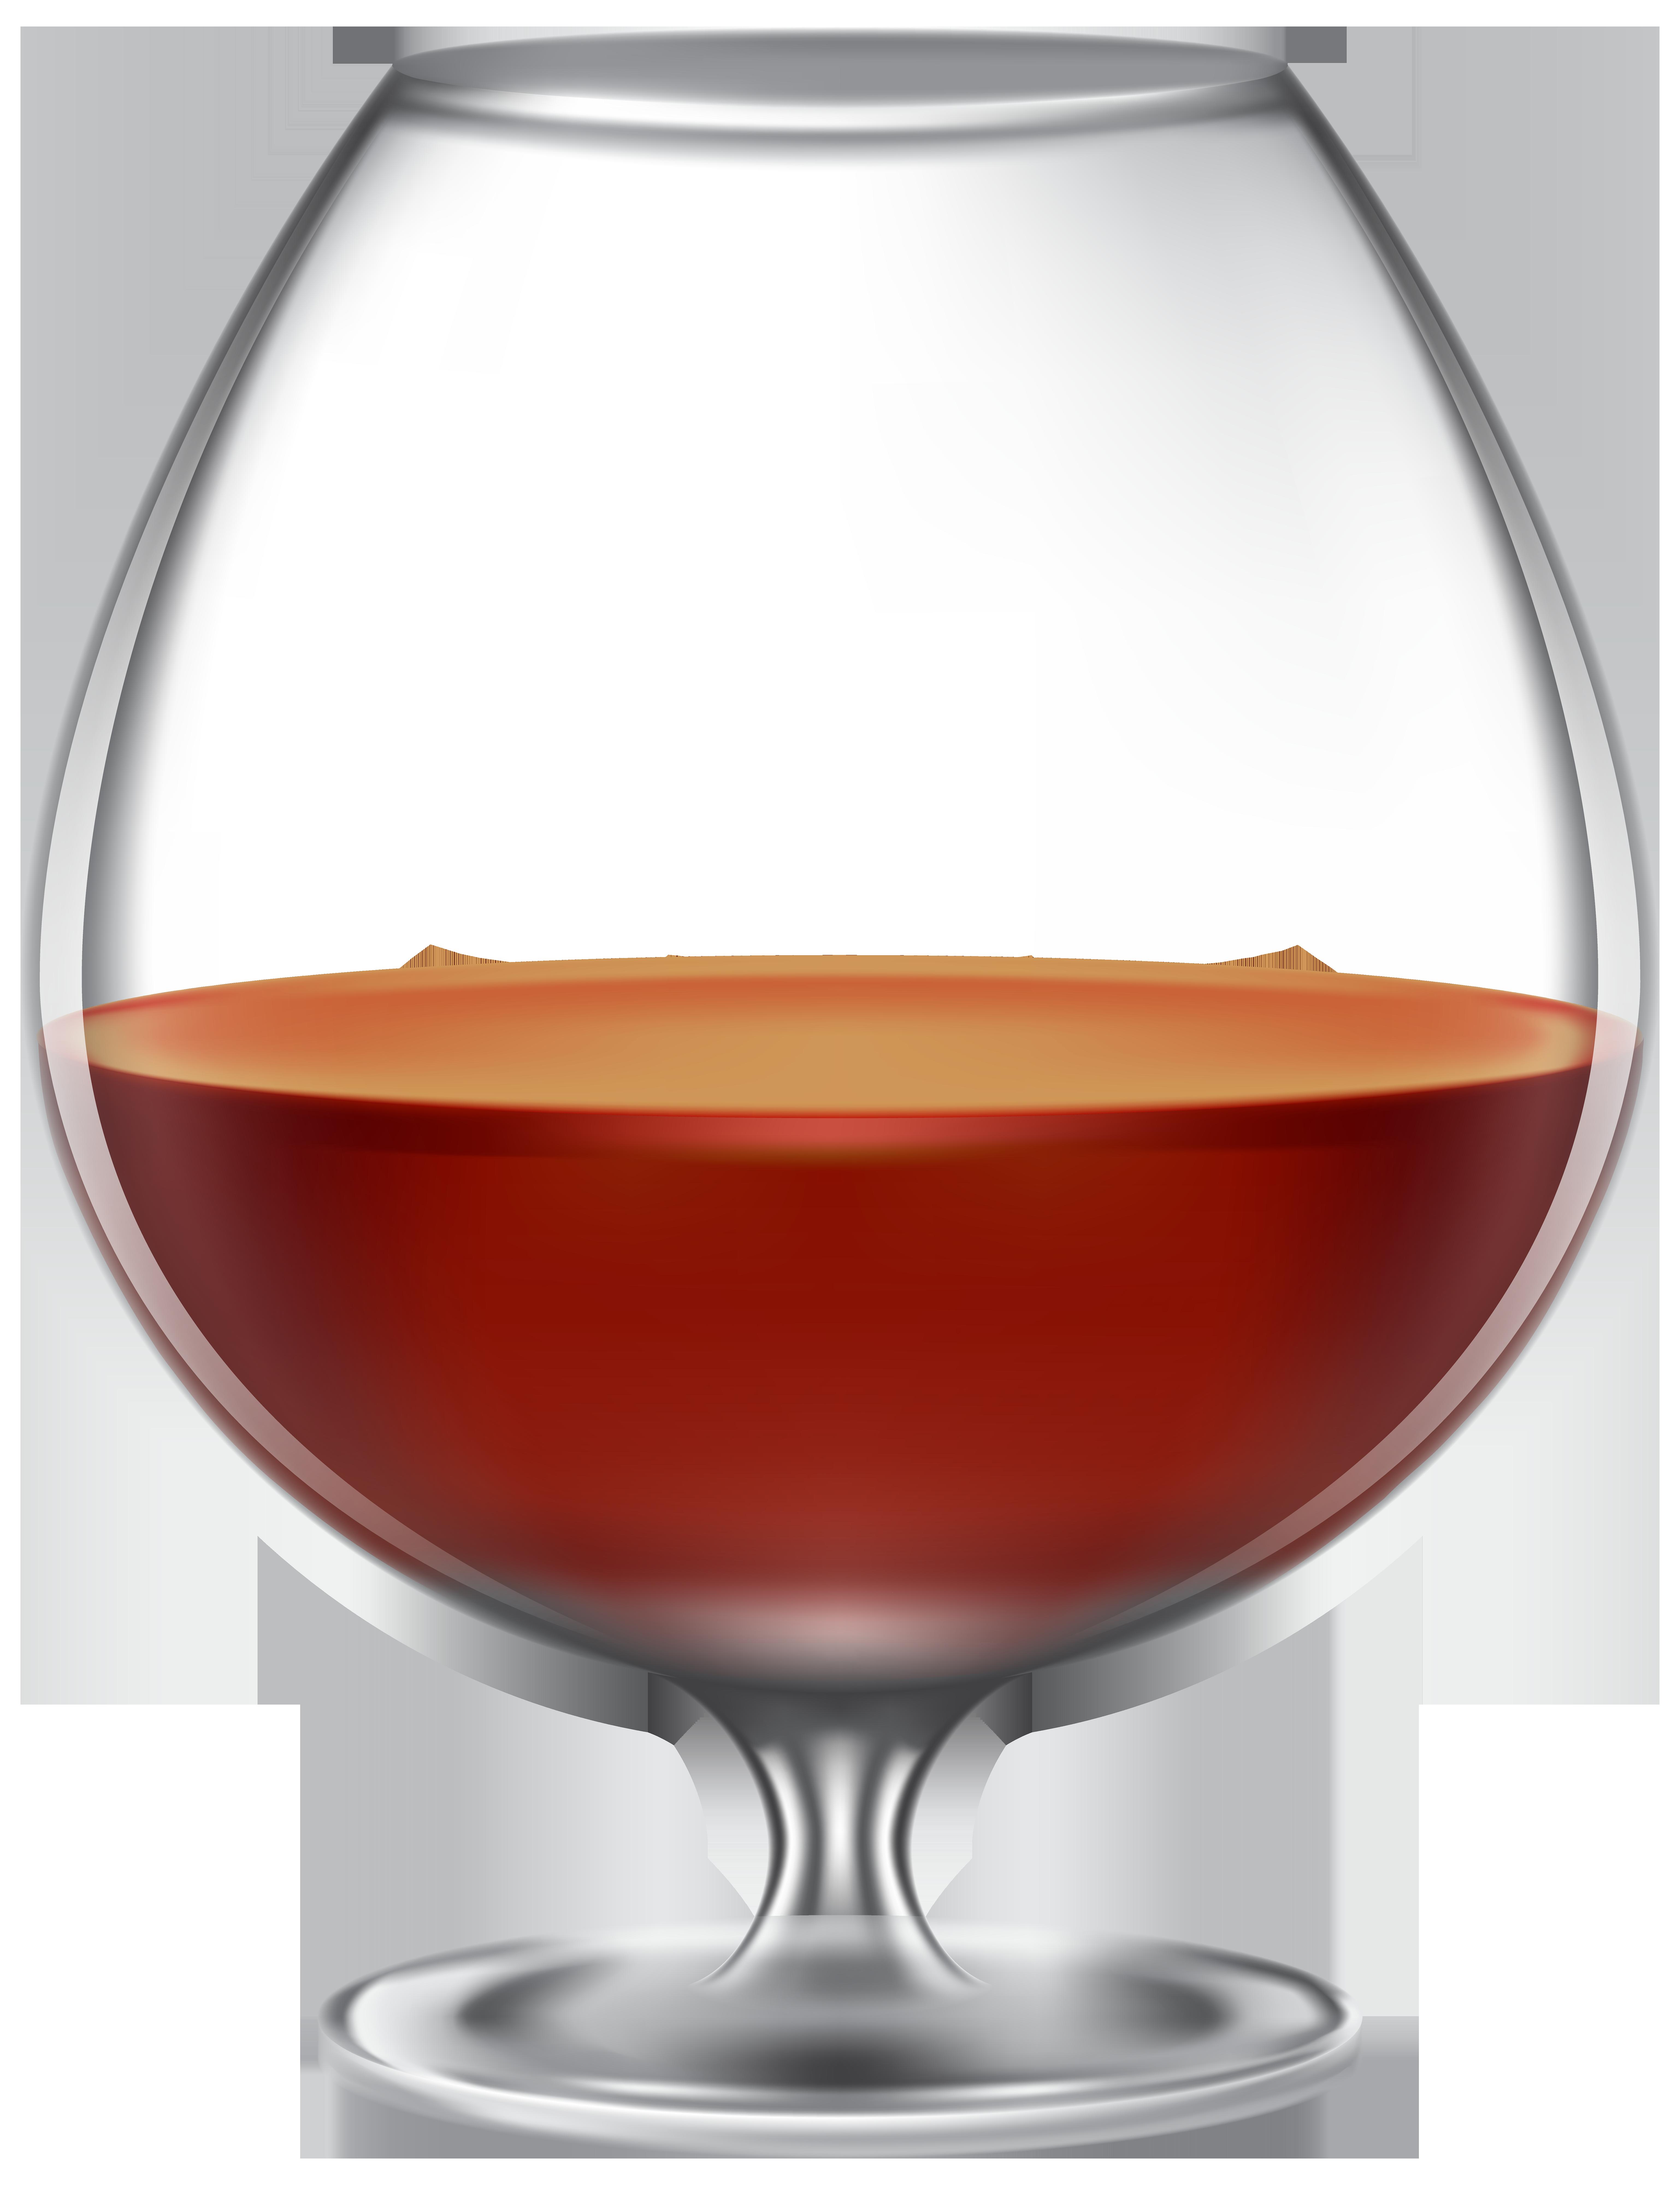 Brandy glass clip art. Drinking clipart beer wine